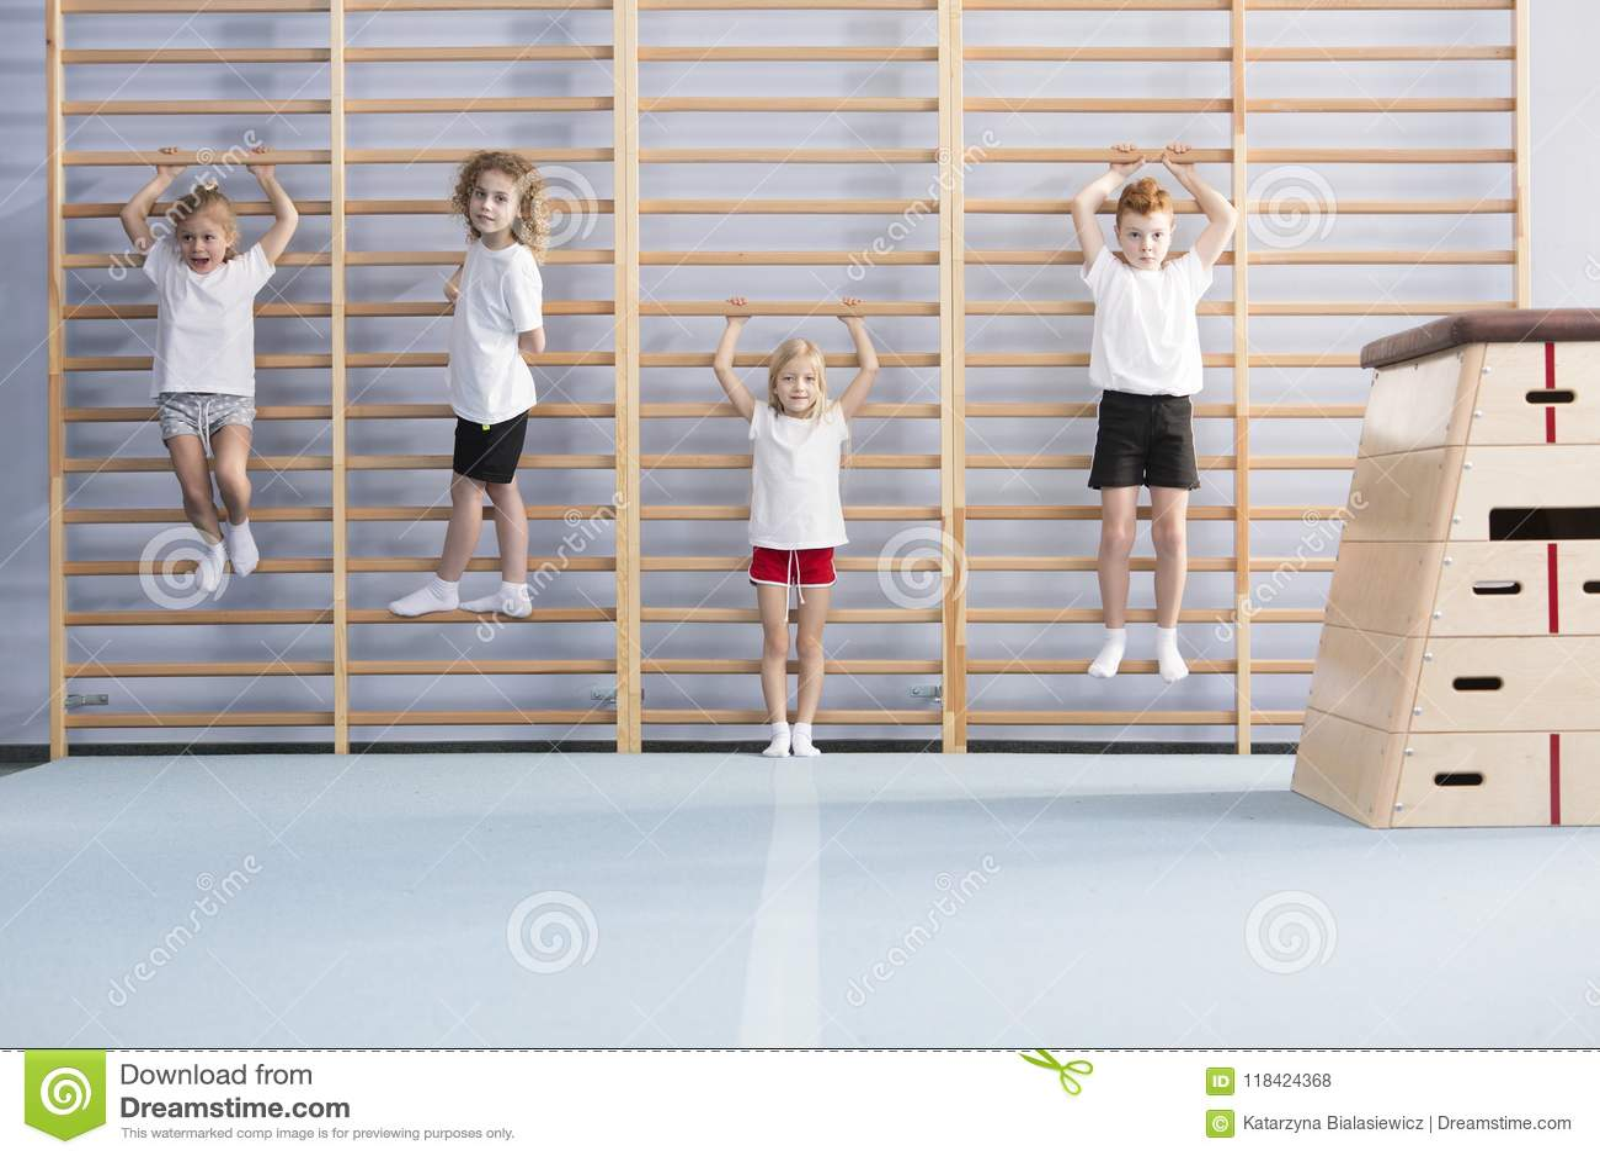 Escolares en barras de pared